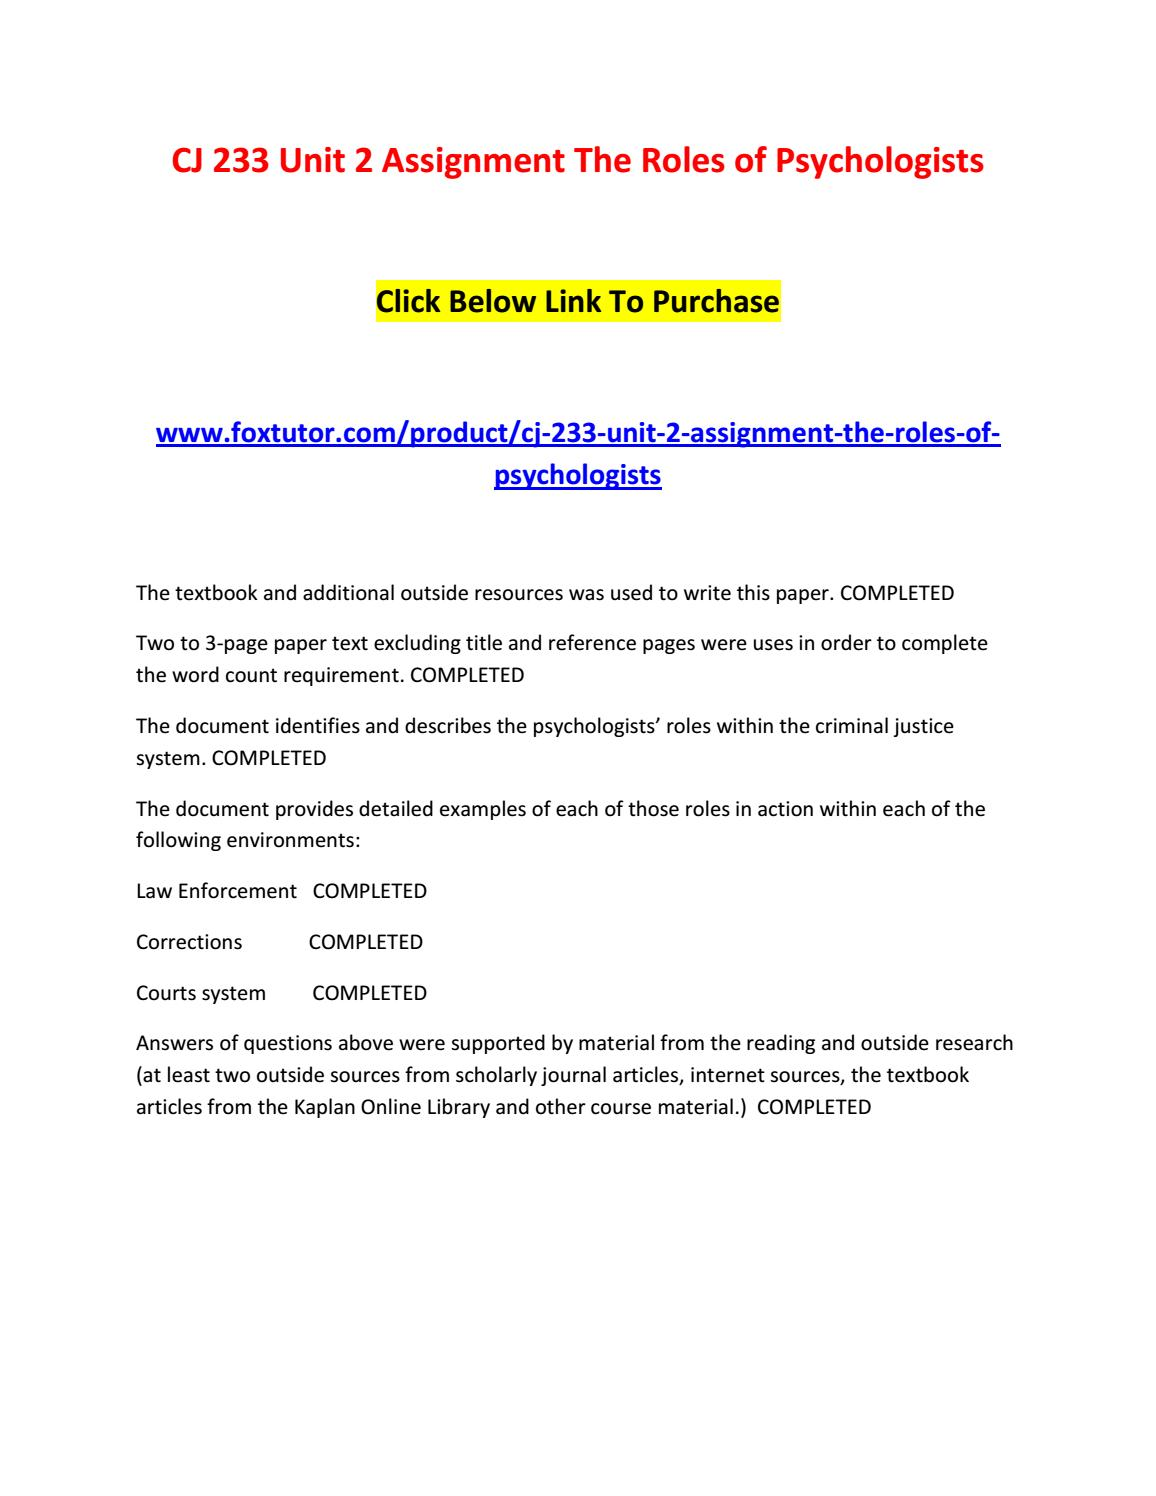 Order assignment online internet